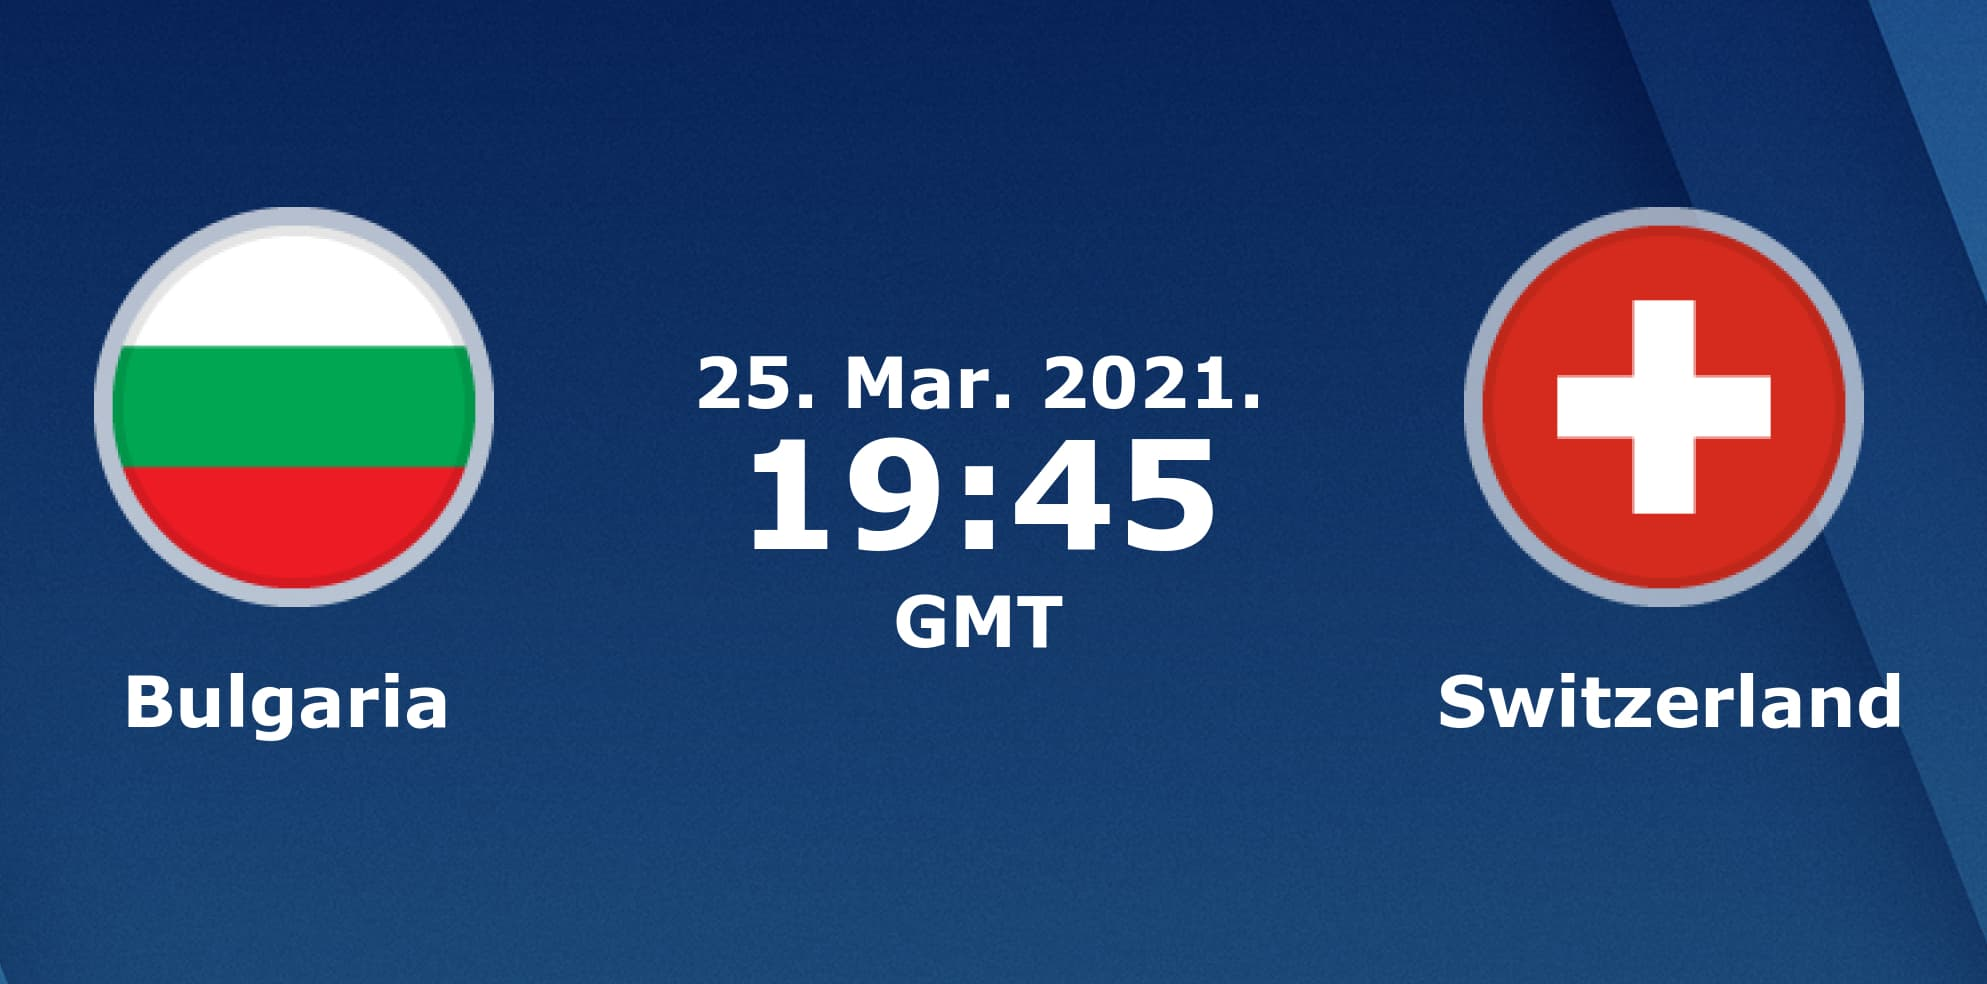 Bulgarien vs. Schweit WM2022 Qualifikation Wett-Tipp